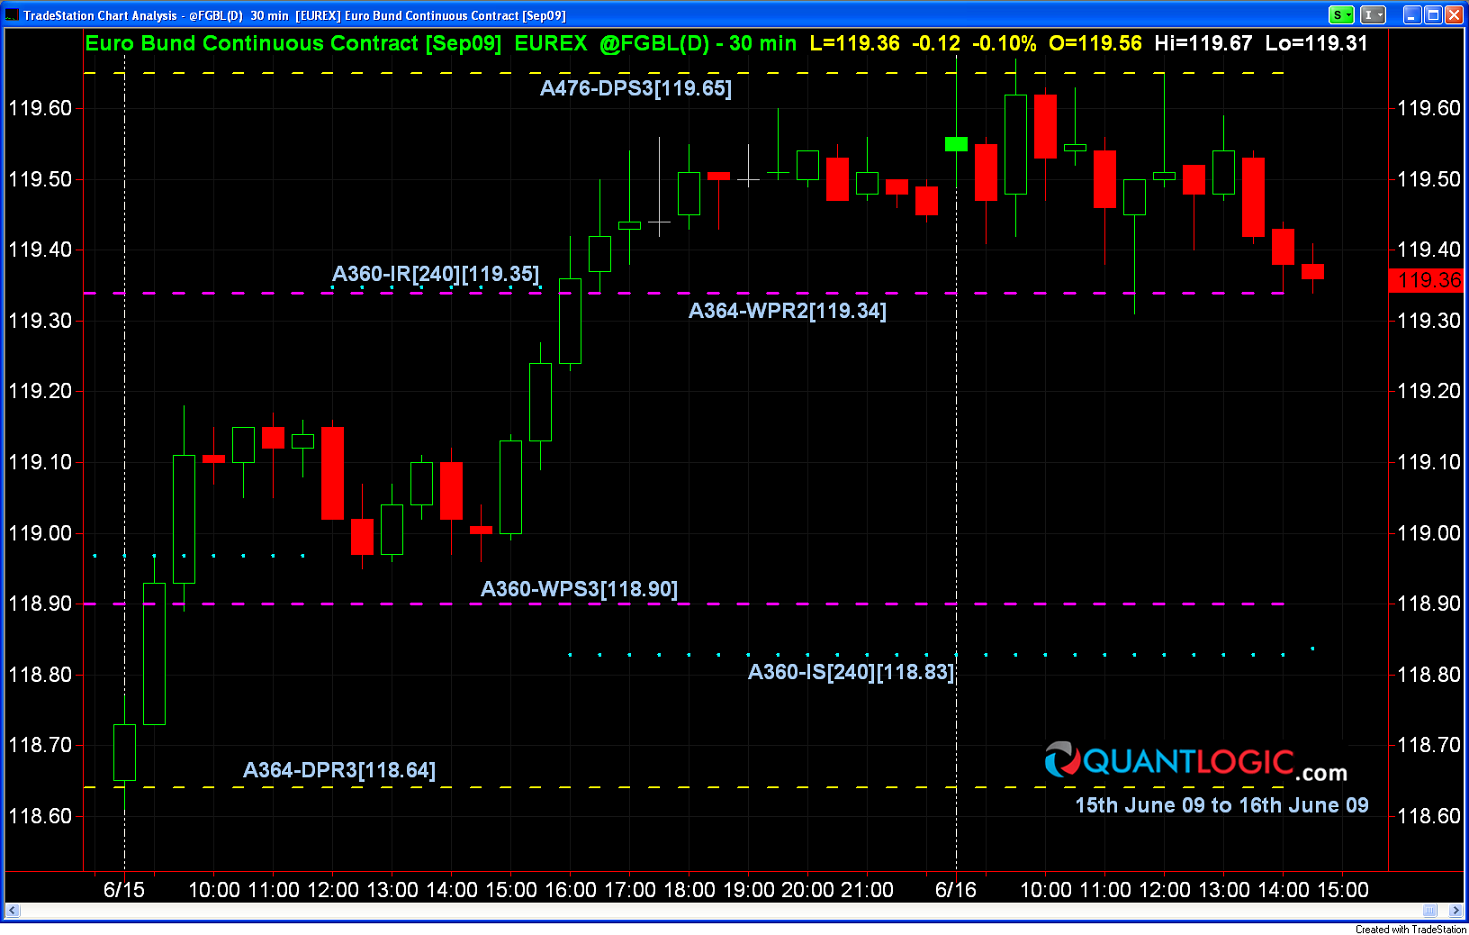 Euro Bund performace - Technical Chart